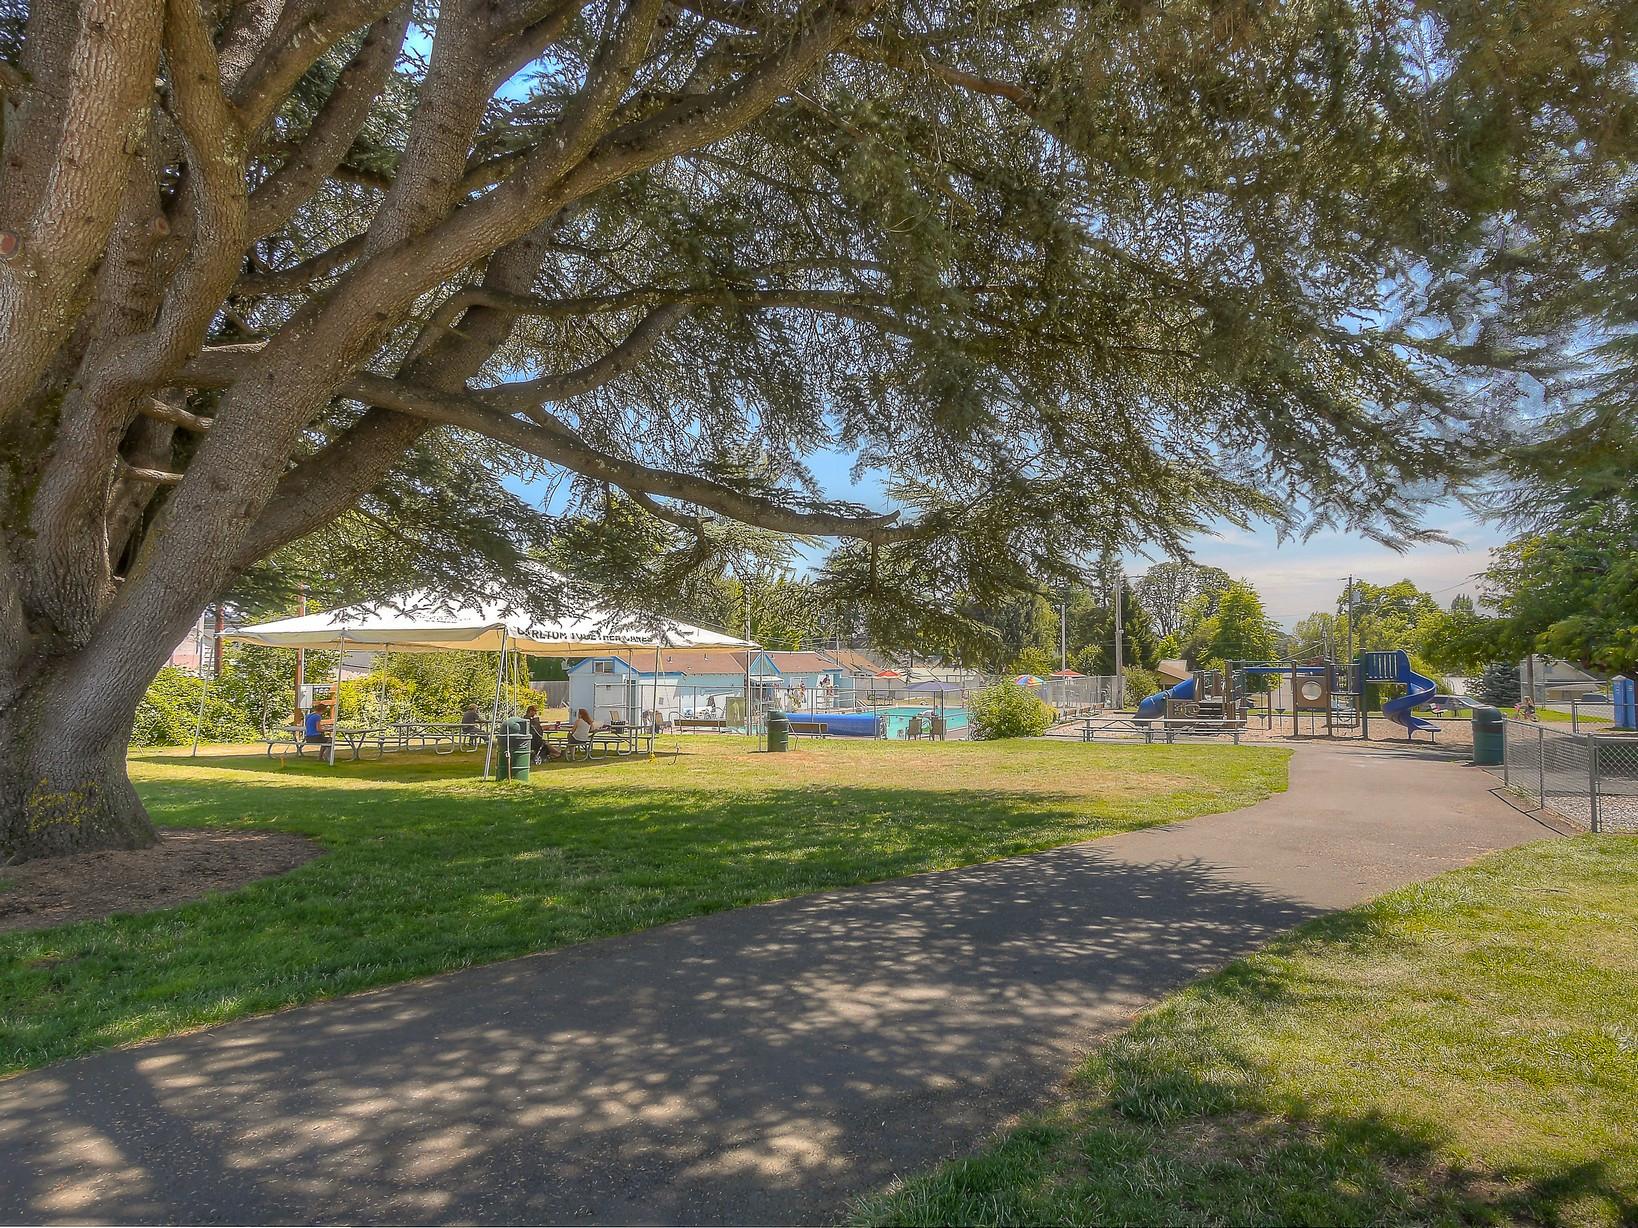 13-carlton-oregon-parks-the-kelly-group-real-estate